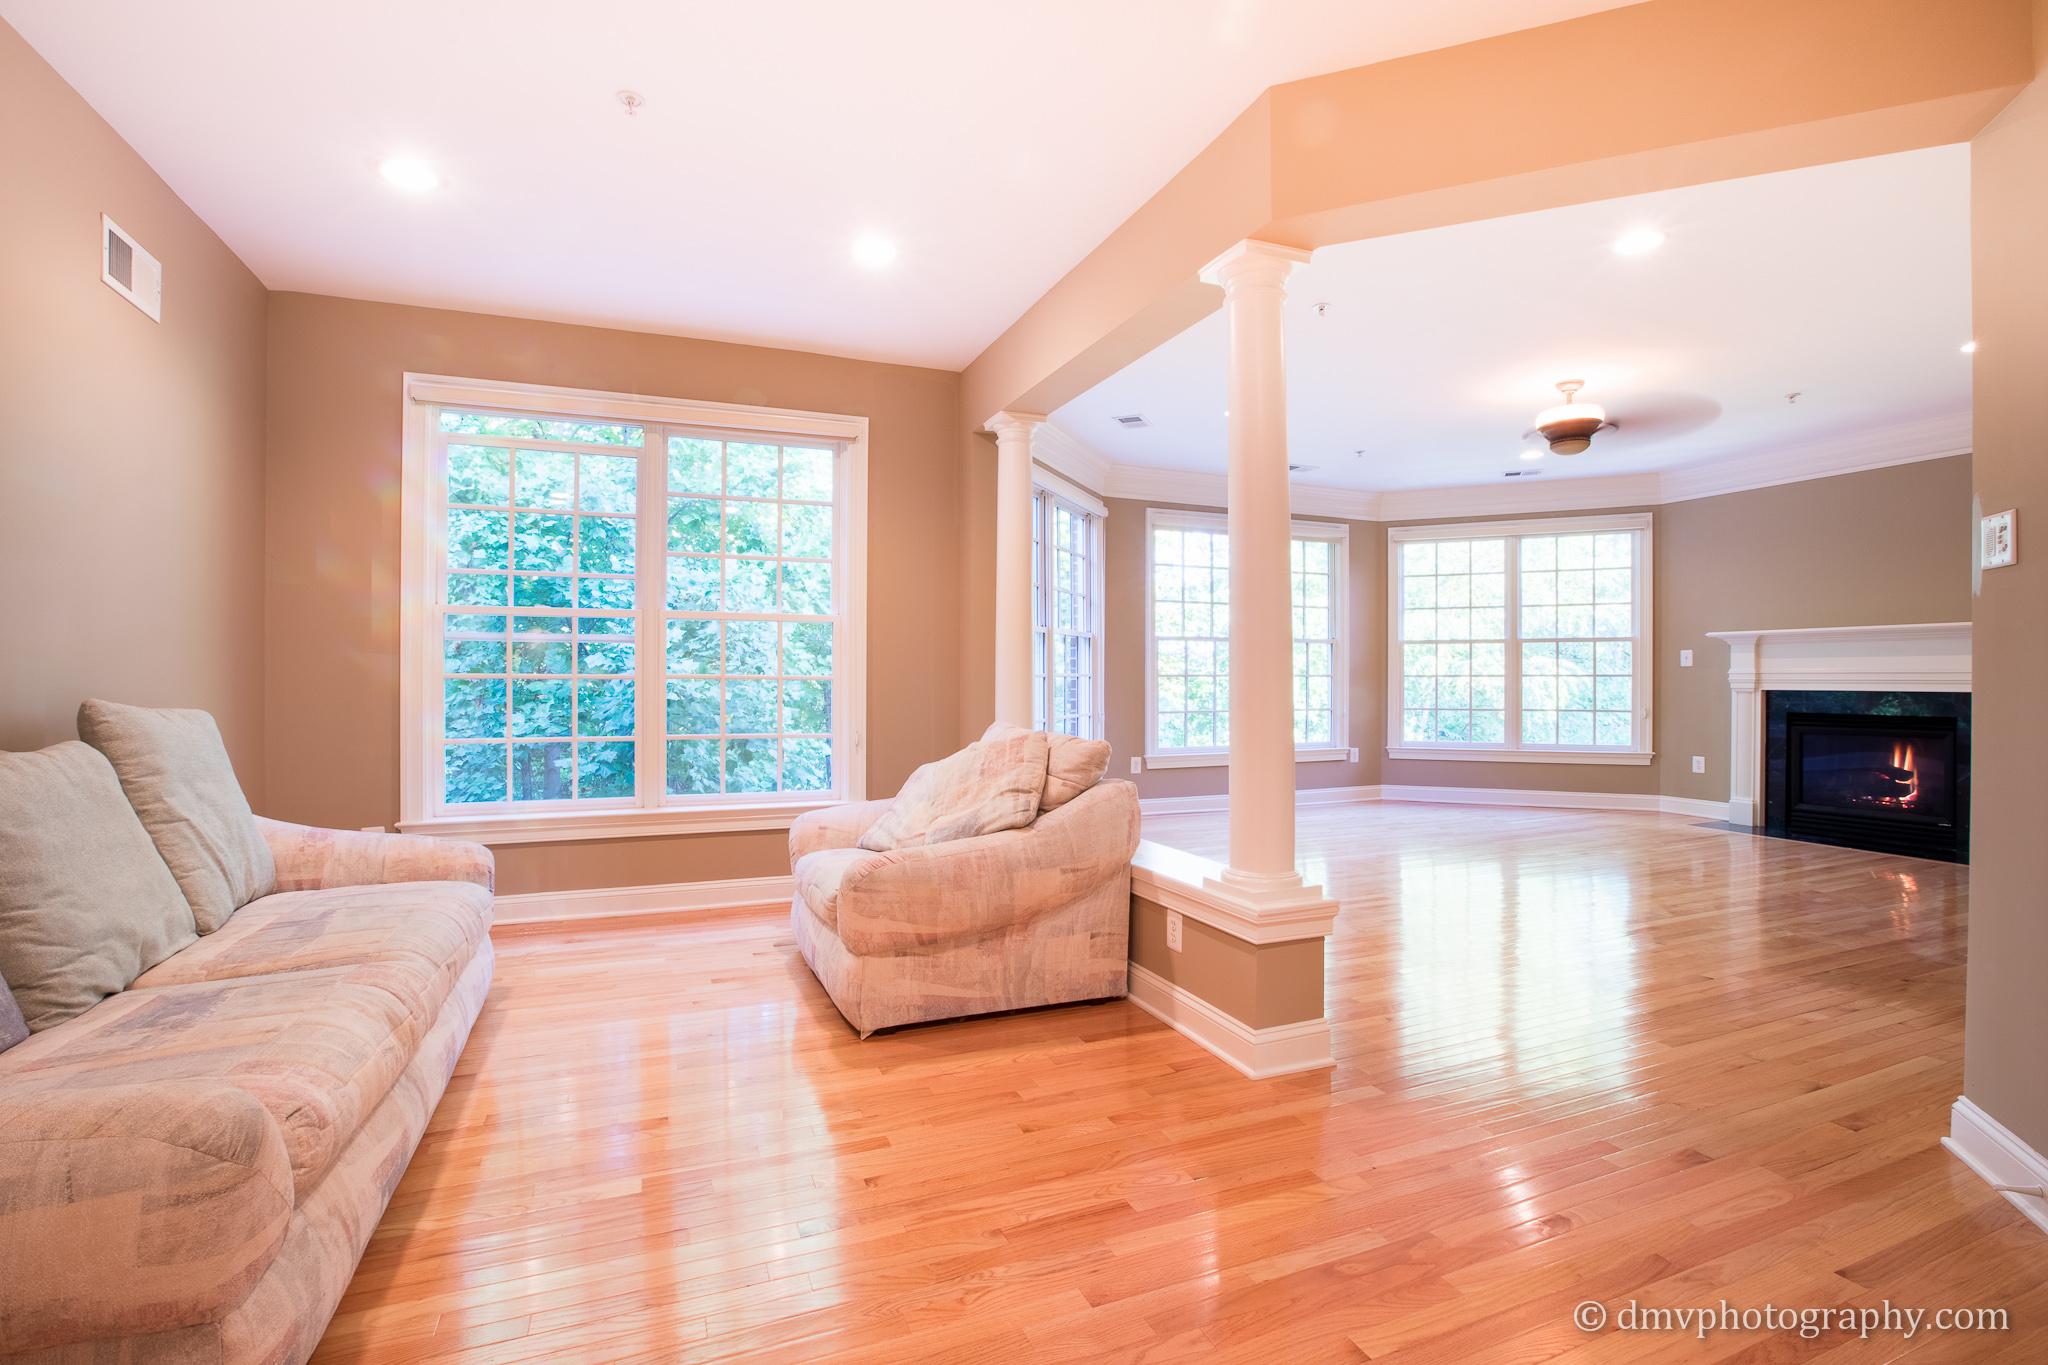 2018-10-07 - House - 00028